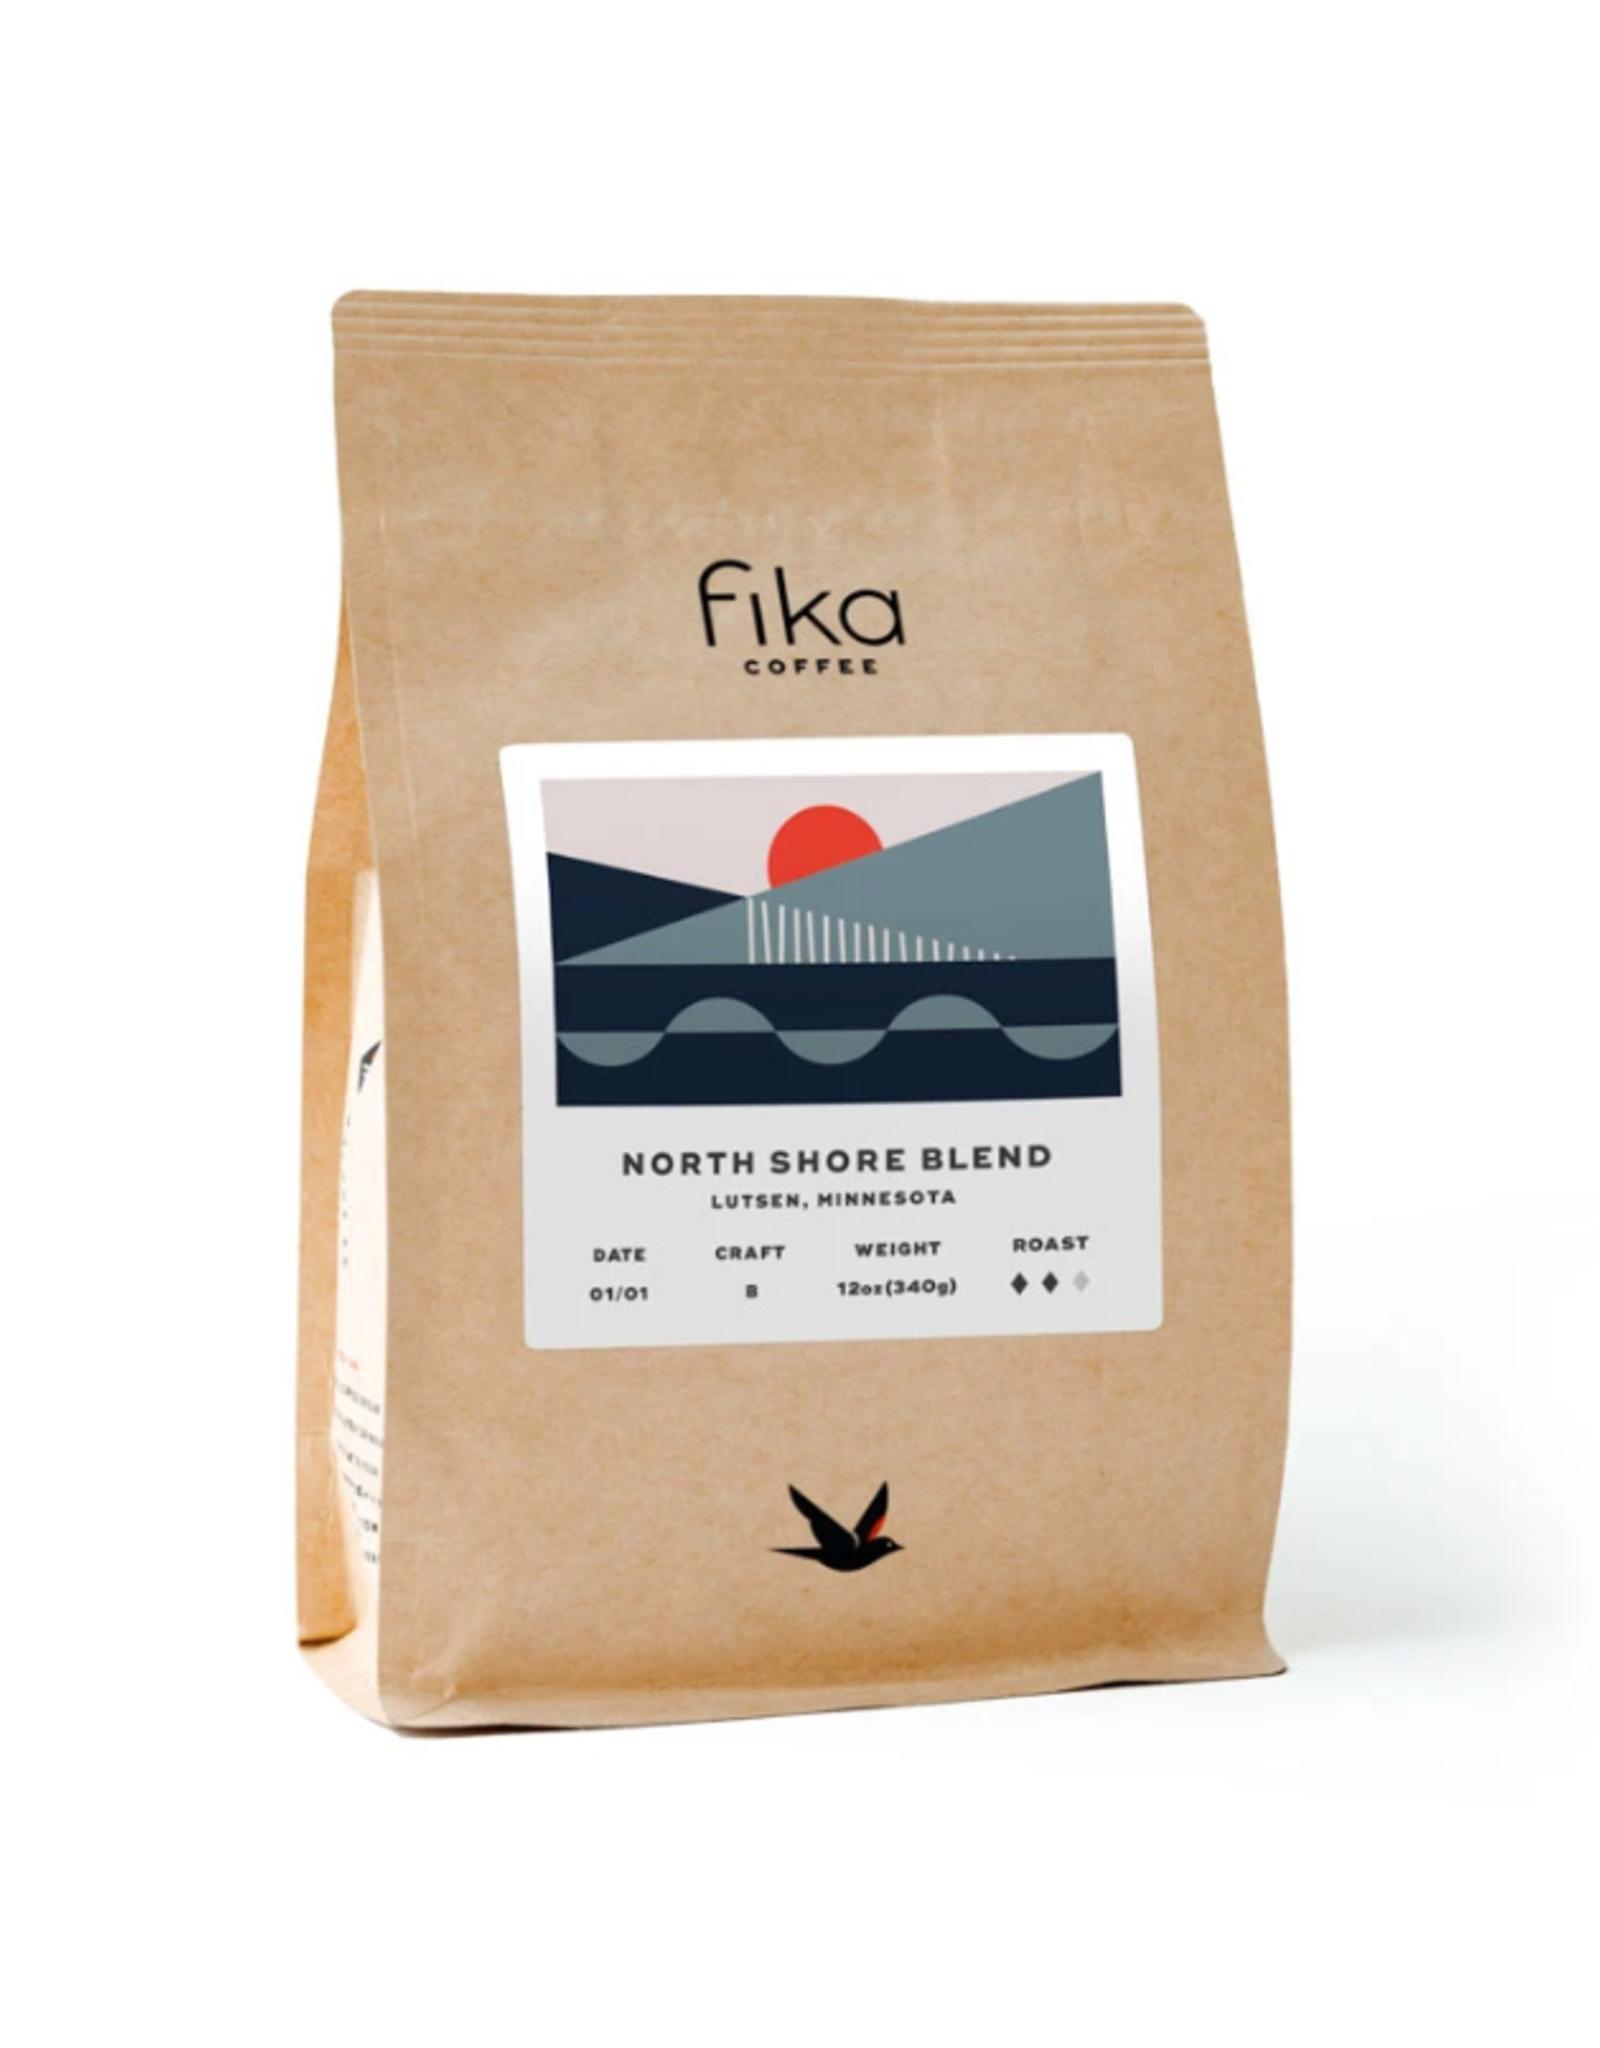 Fika Coffee Fika North Shore Blend, 12 oz, Whole Bean